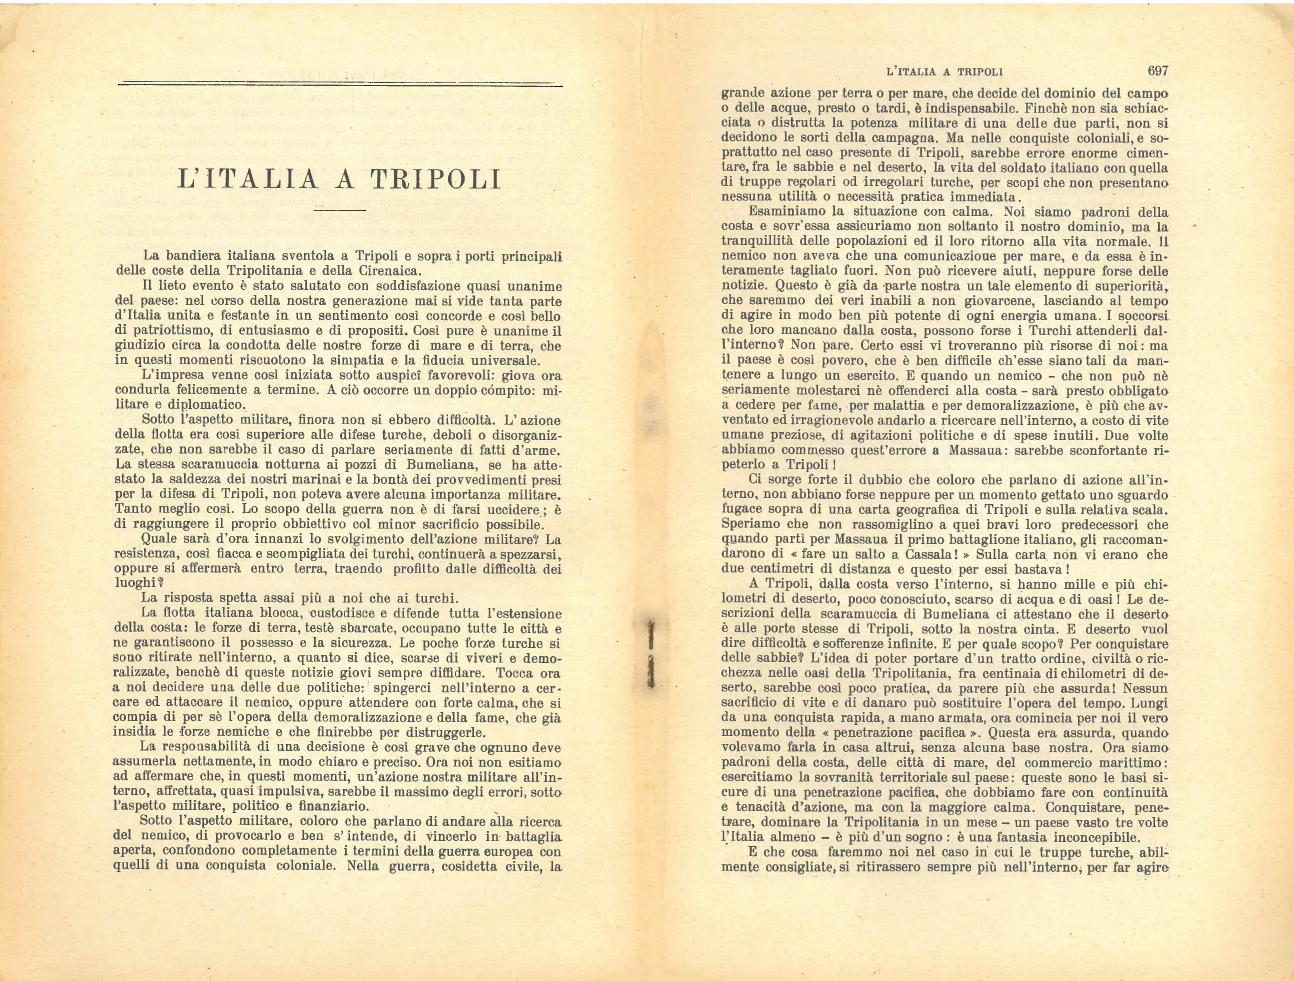 L'italia a Tripoli #1